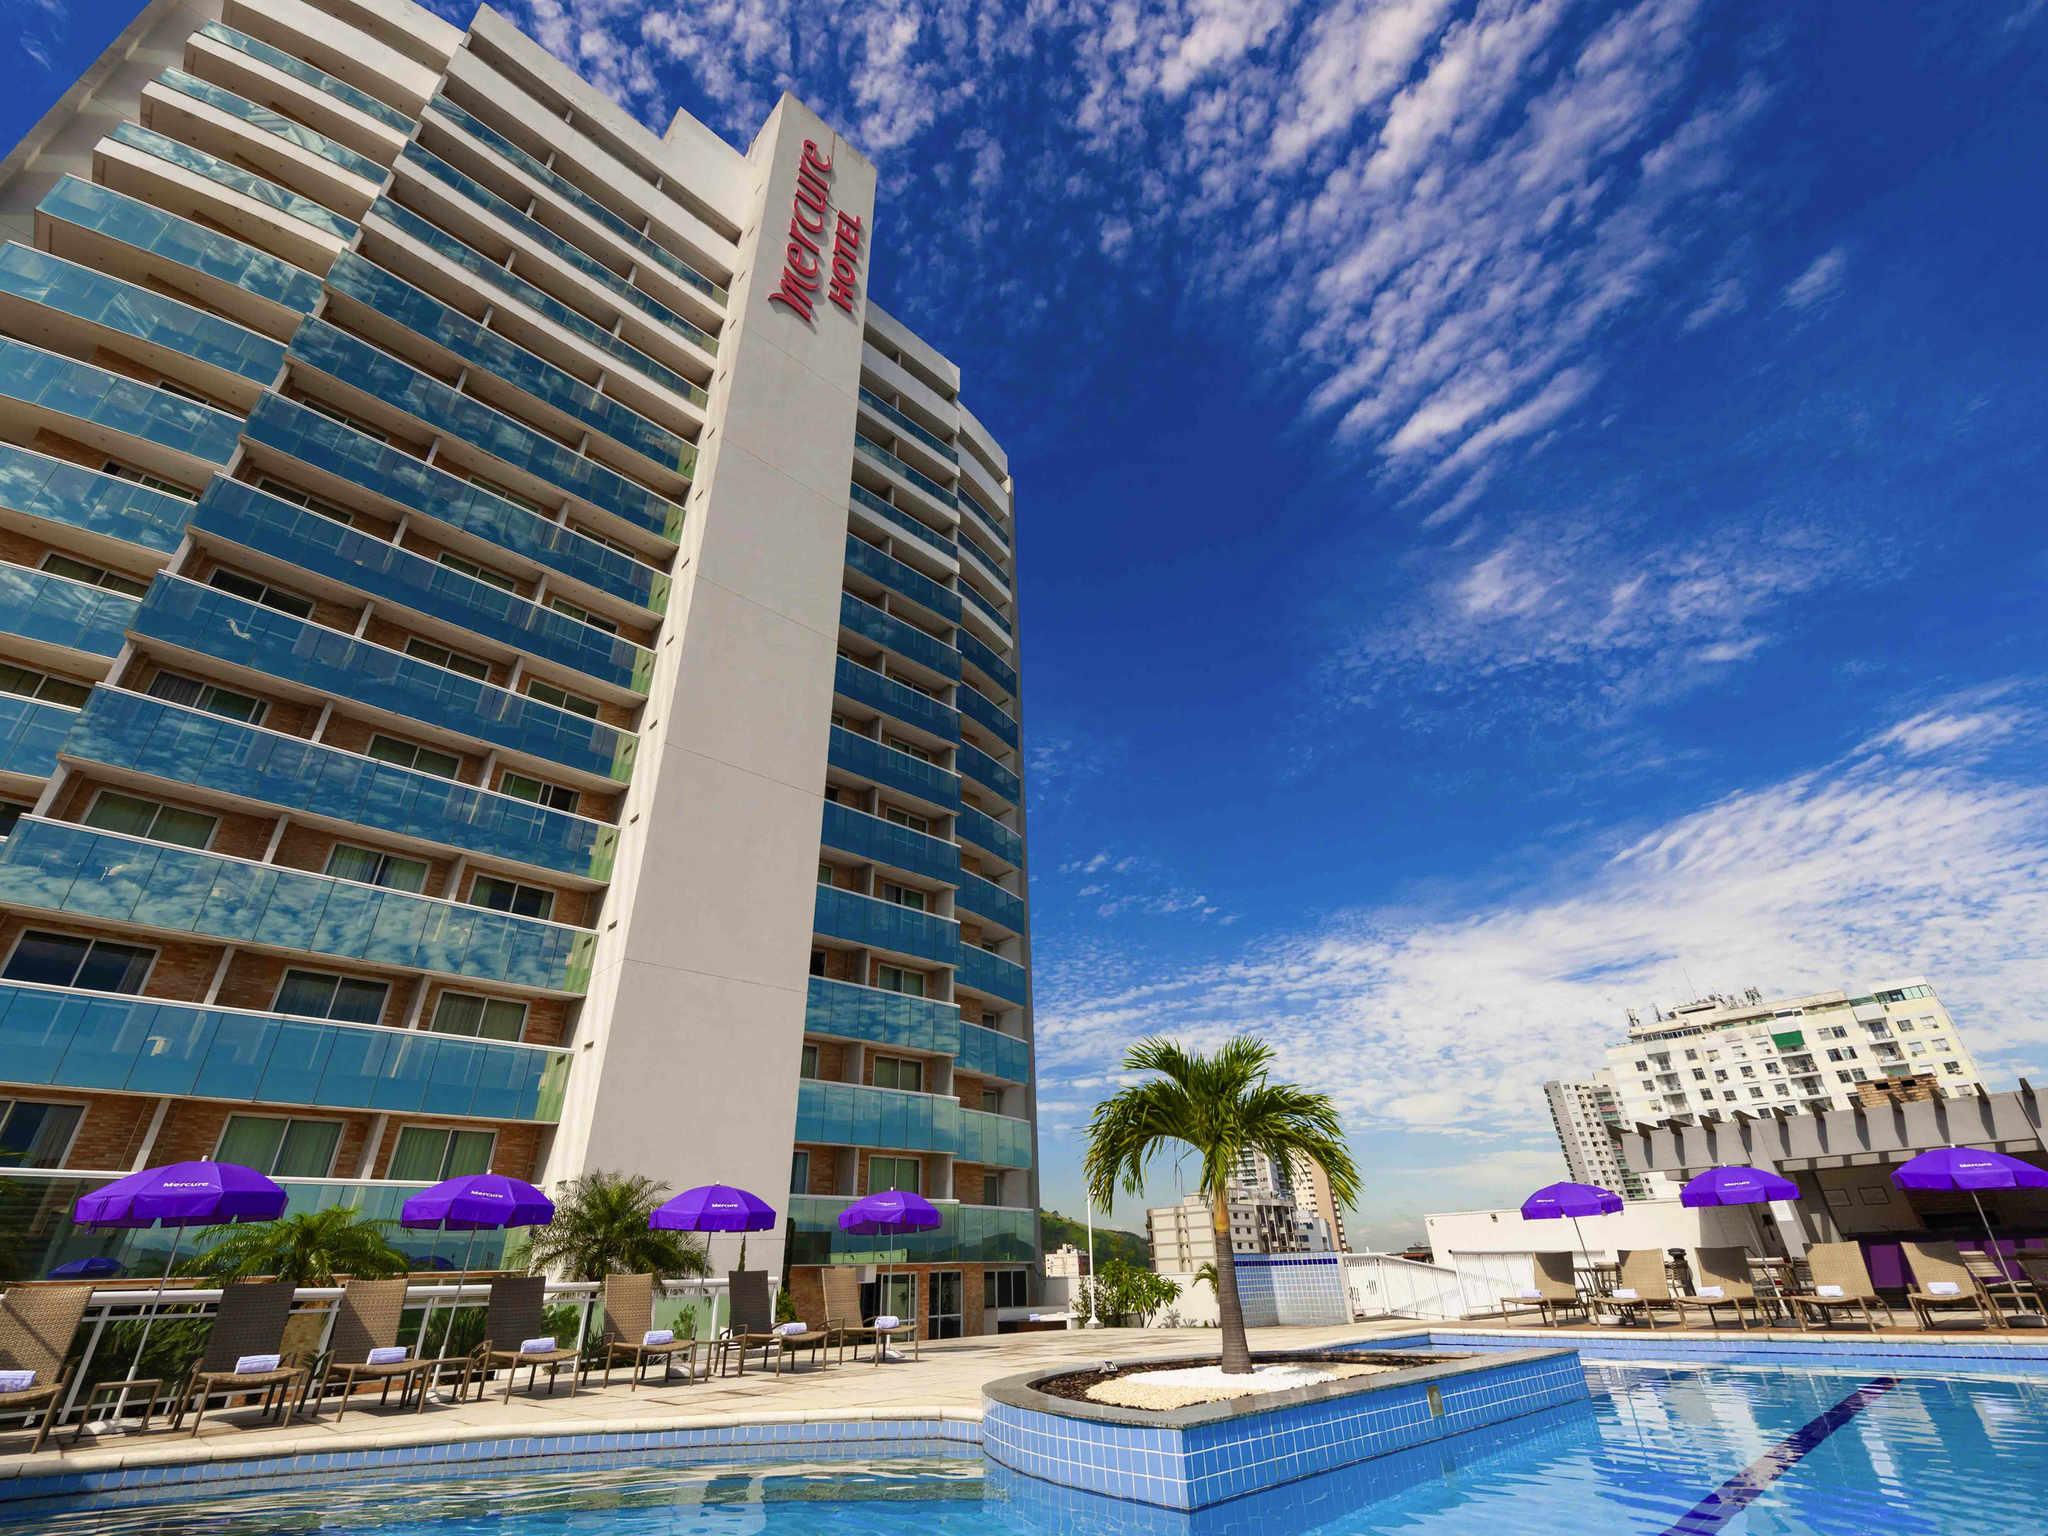 Hôtel - Mercure Rio de Janeiro Nova Iguacu Hotel